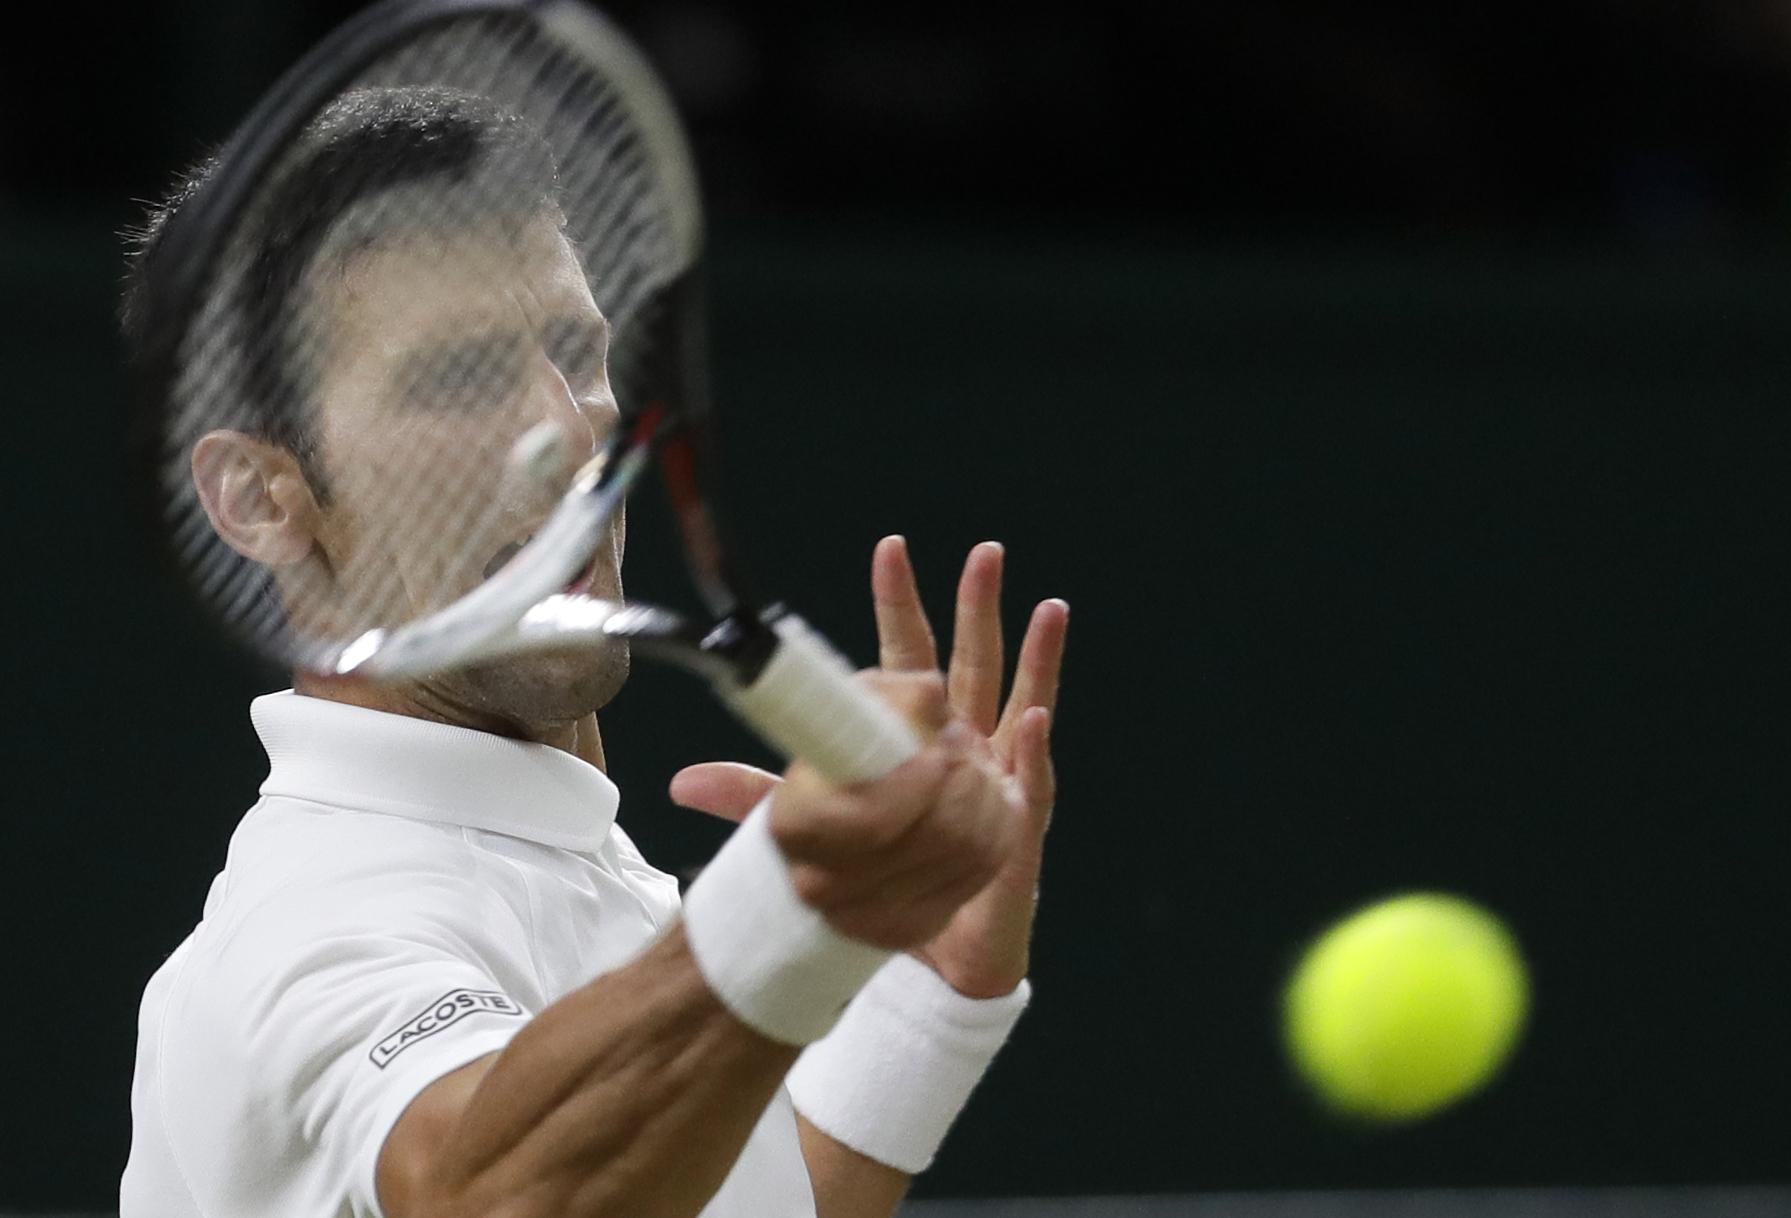 Tennis - Wimbledon - Le combat des chefs Nadal-Djokovic reprendra samedi